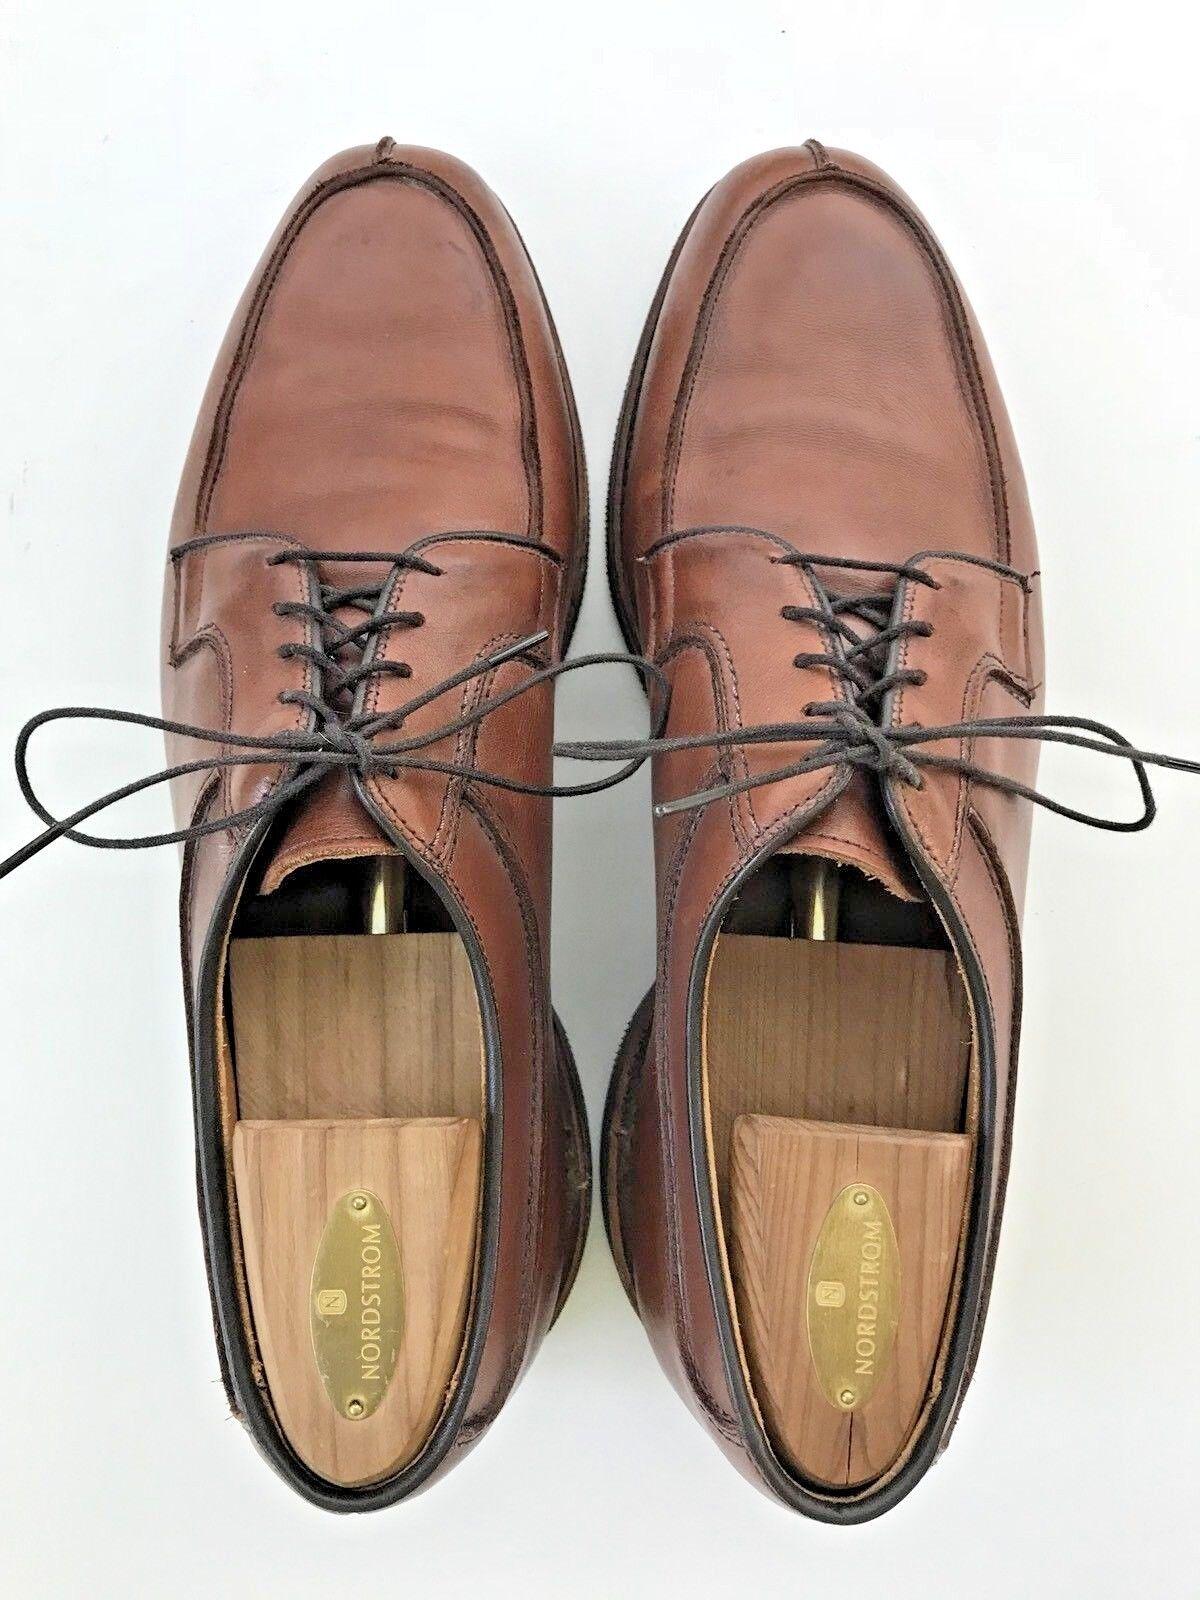 Allen Allen Allen Edmonds para hombre Stockbridge Marrón Split-Toe Suela De Goma Zapatos EE. UU. 11 D 342098